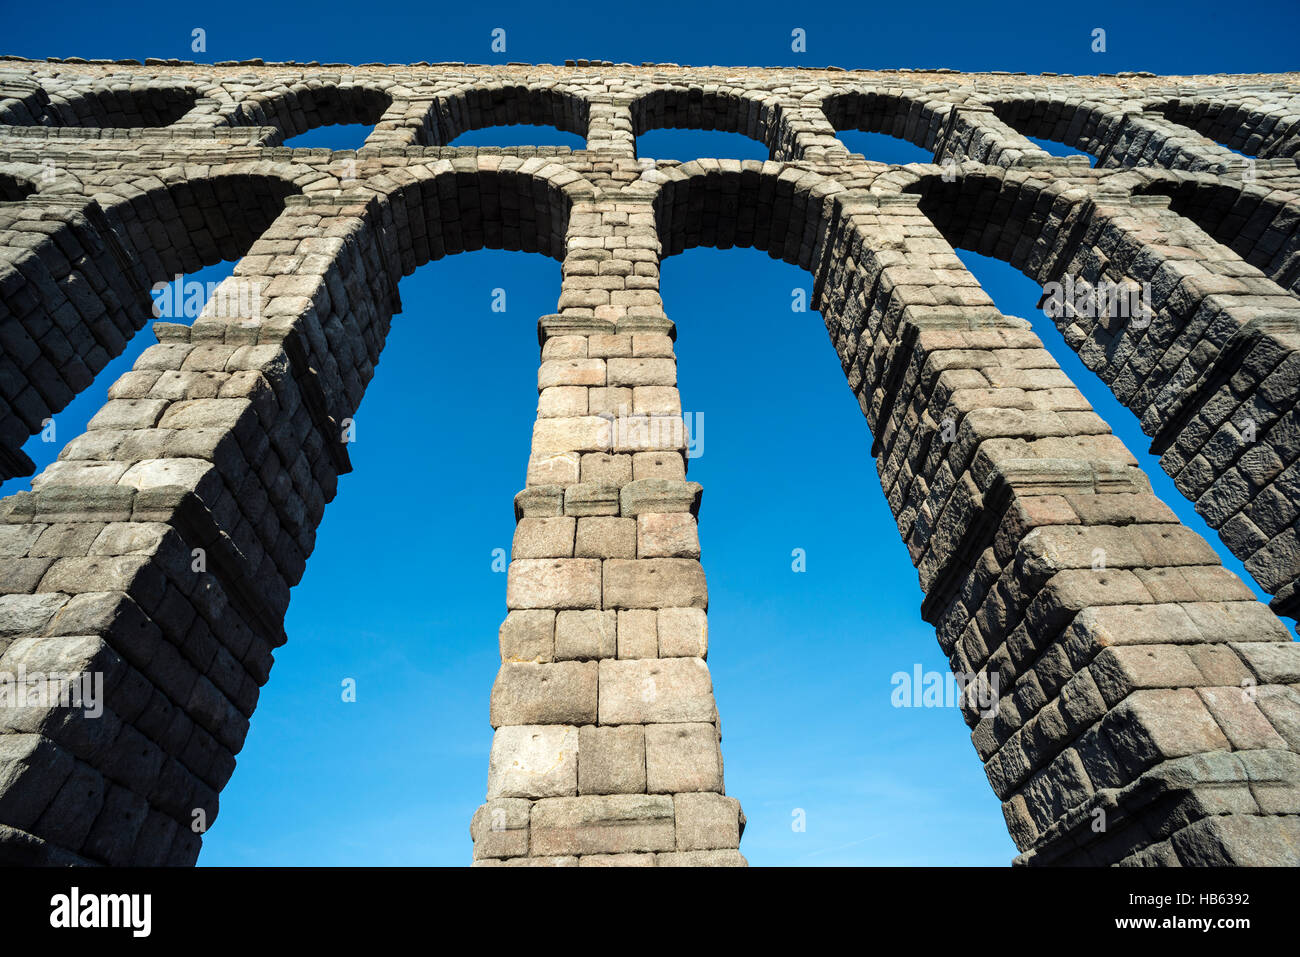 Looking up at Segovia's 1st century Roman Aqueduct in the Plaza Azuguejo, Segovia, Spain Stock Photo